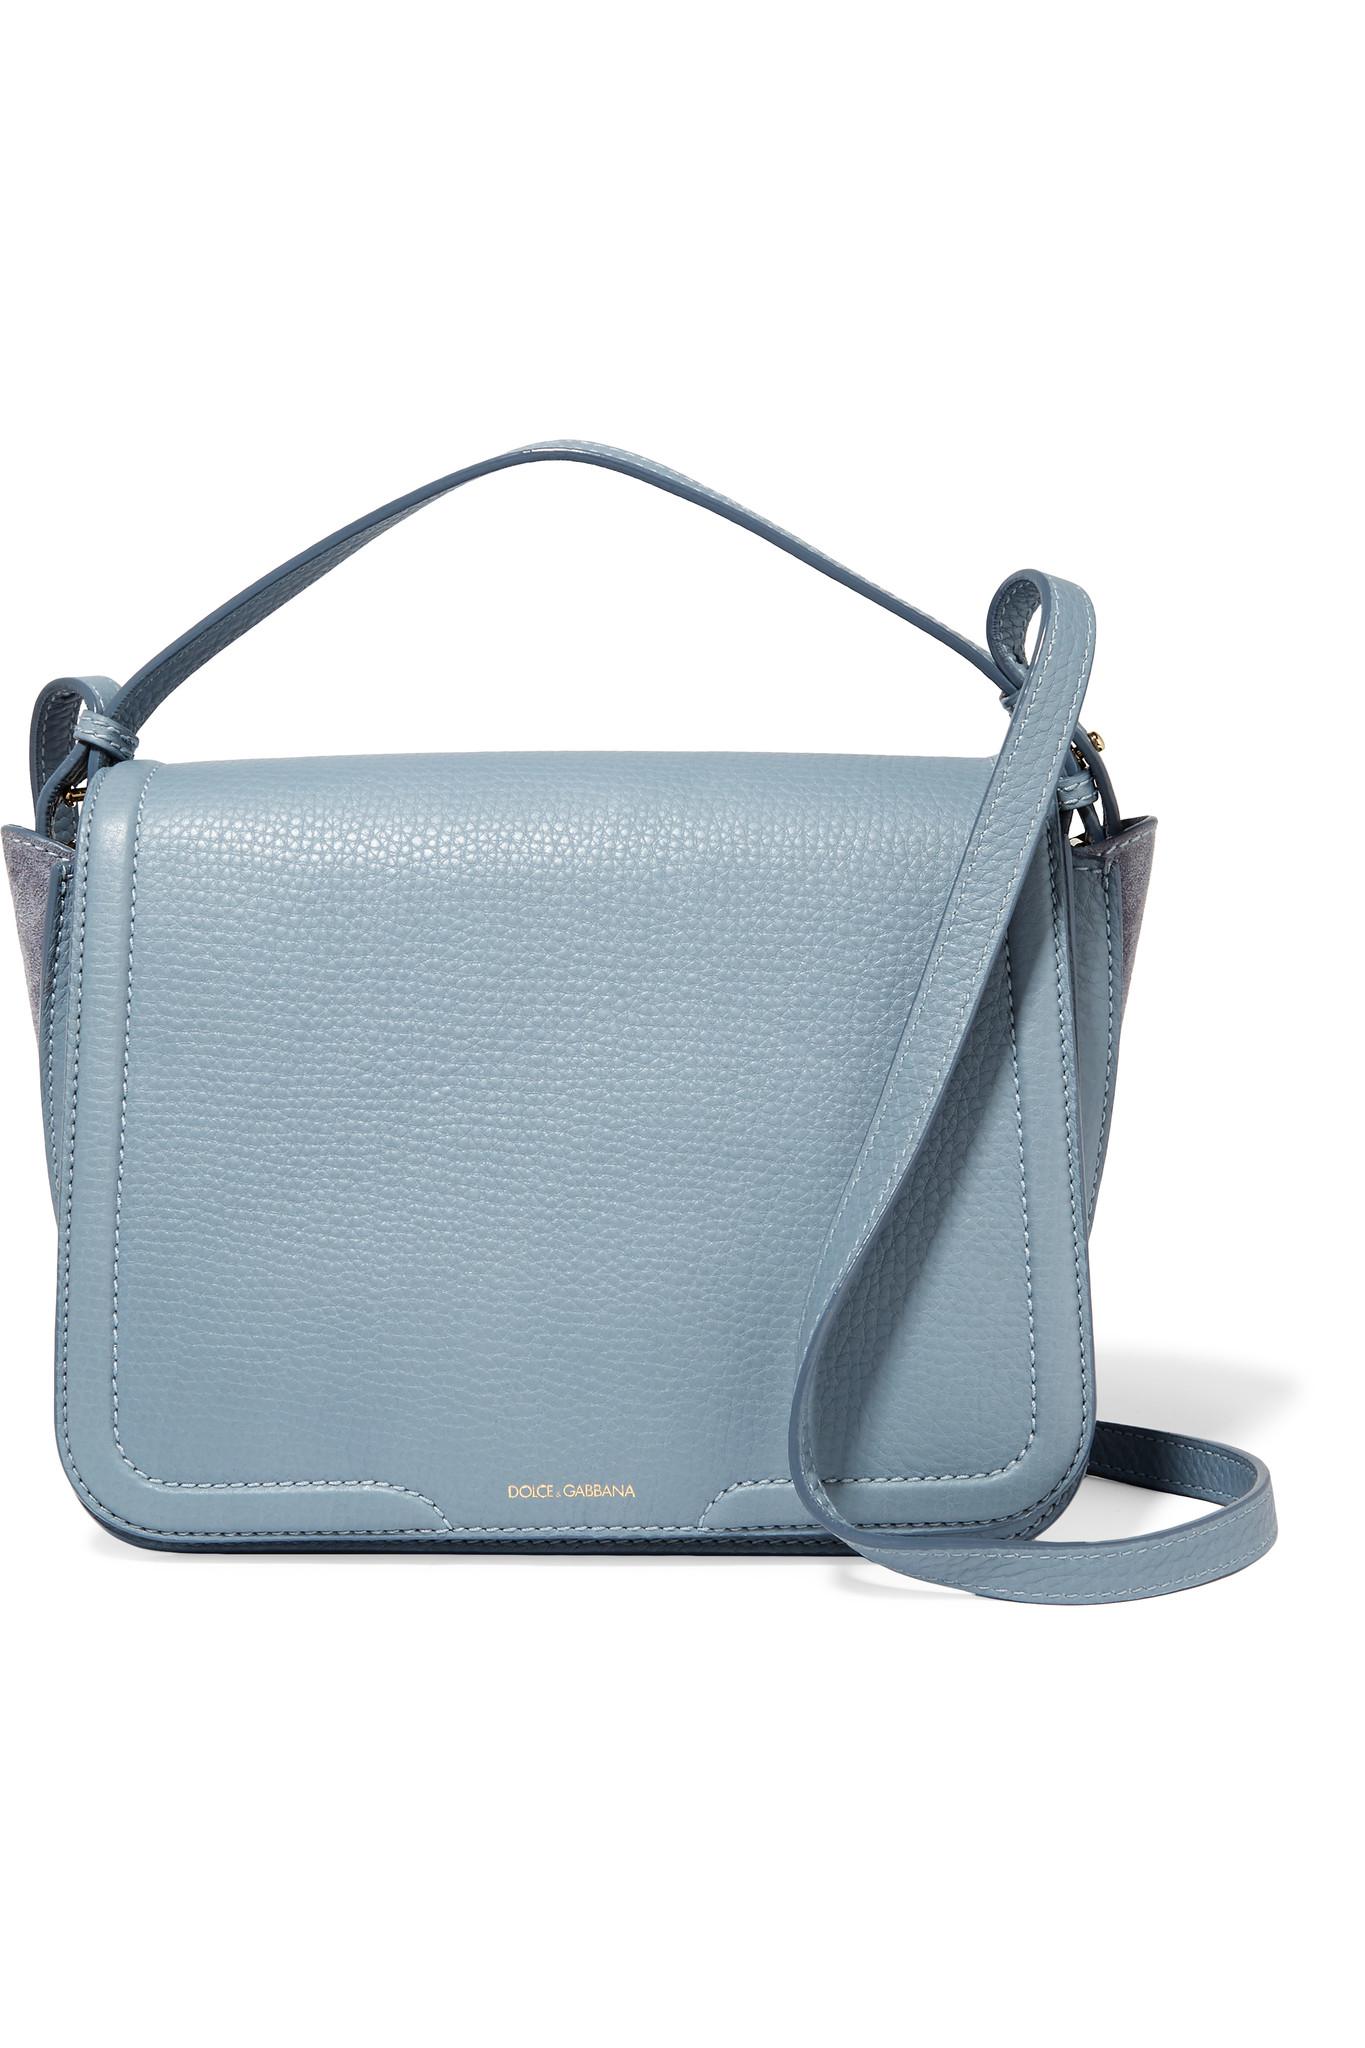 40824909024a Lyst - Dolce   Gabbana Suede-paneled Textured-leather Shoulder Bag ...